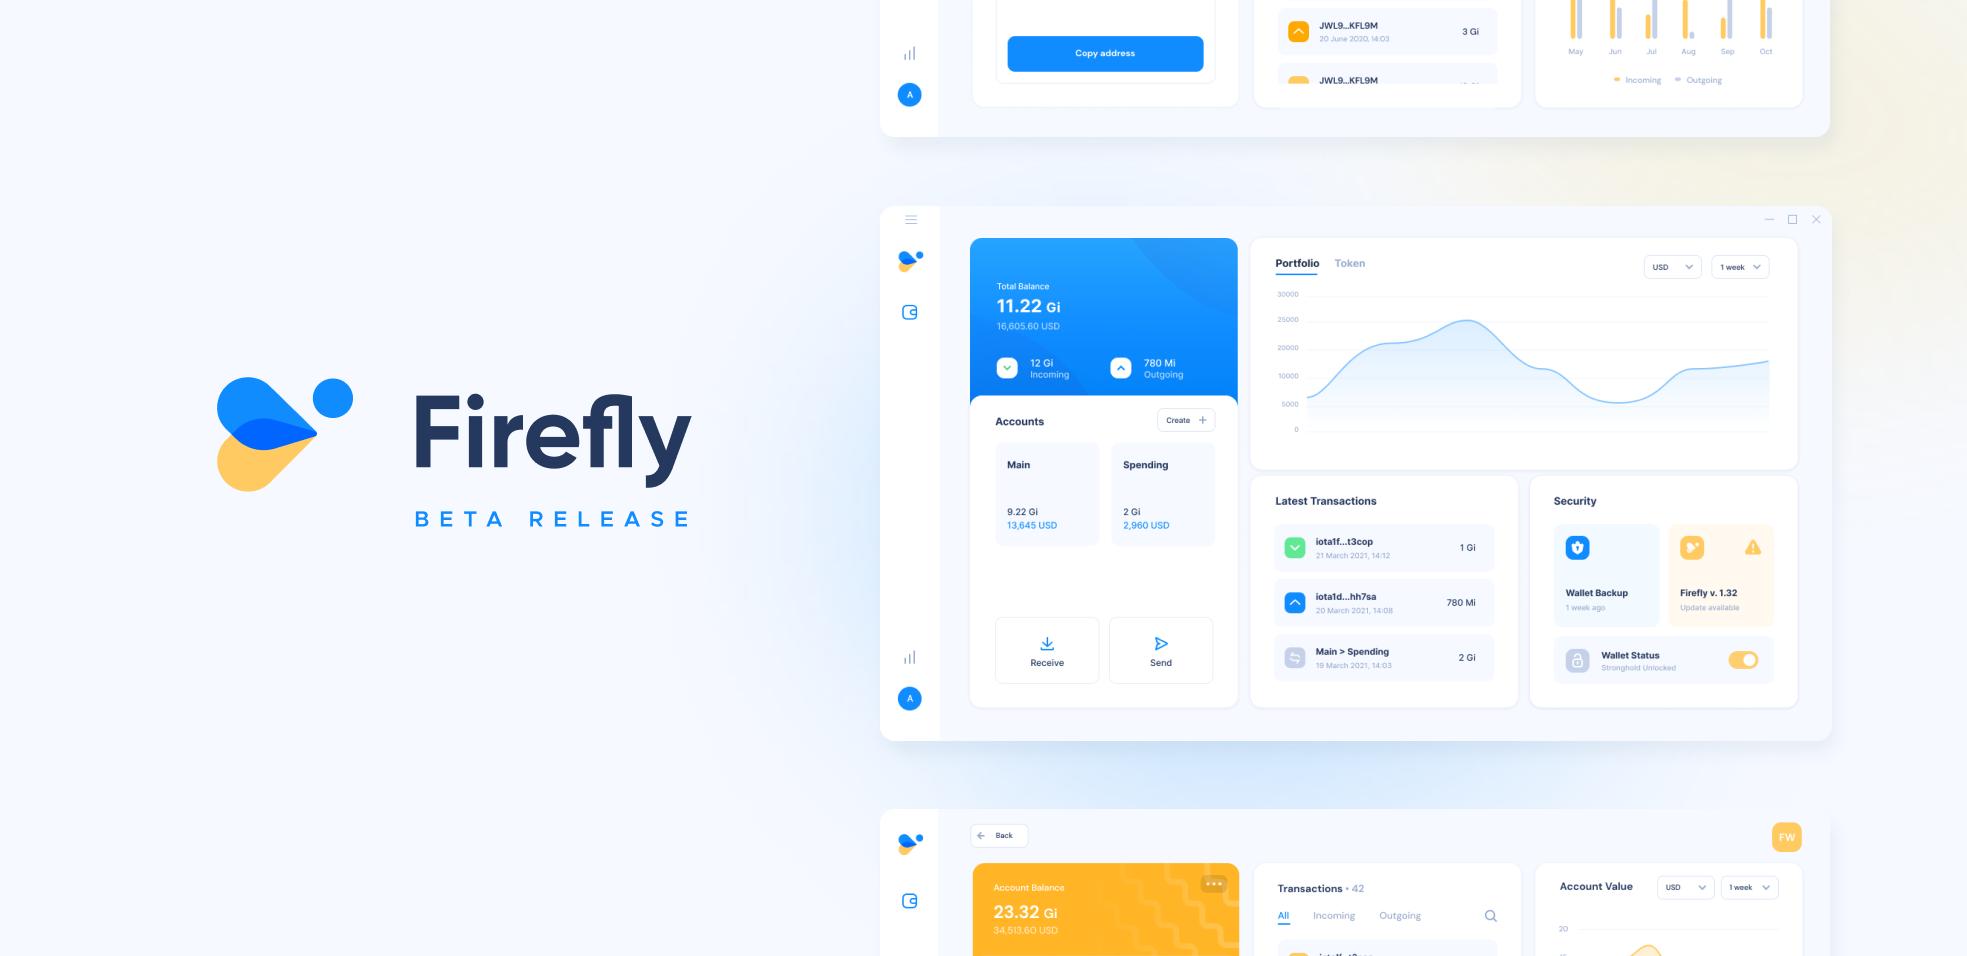 Firefly Beta Release